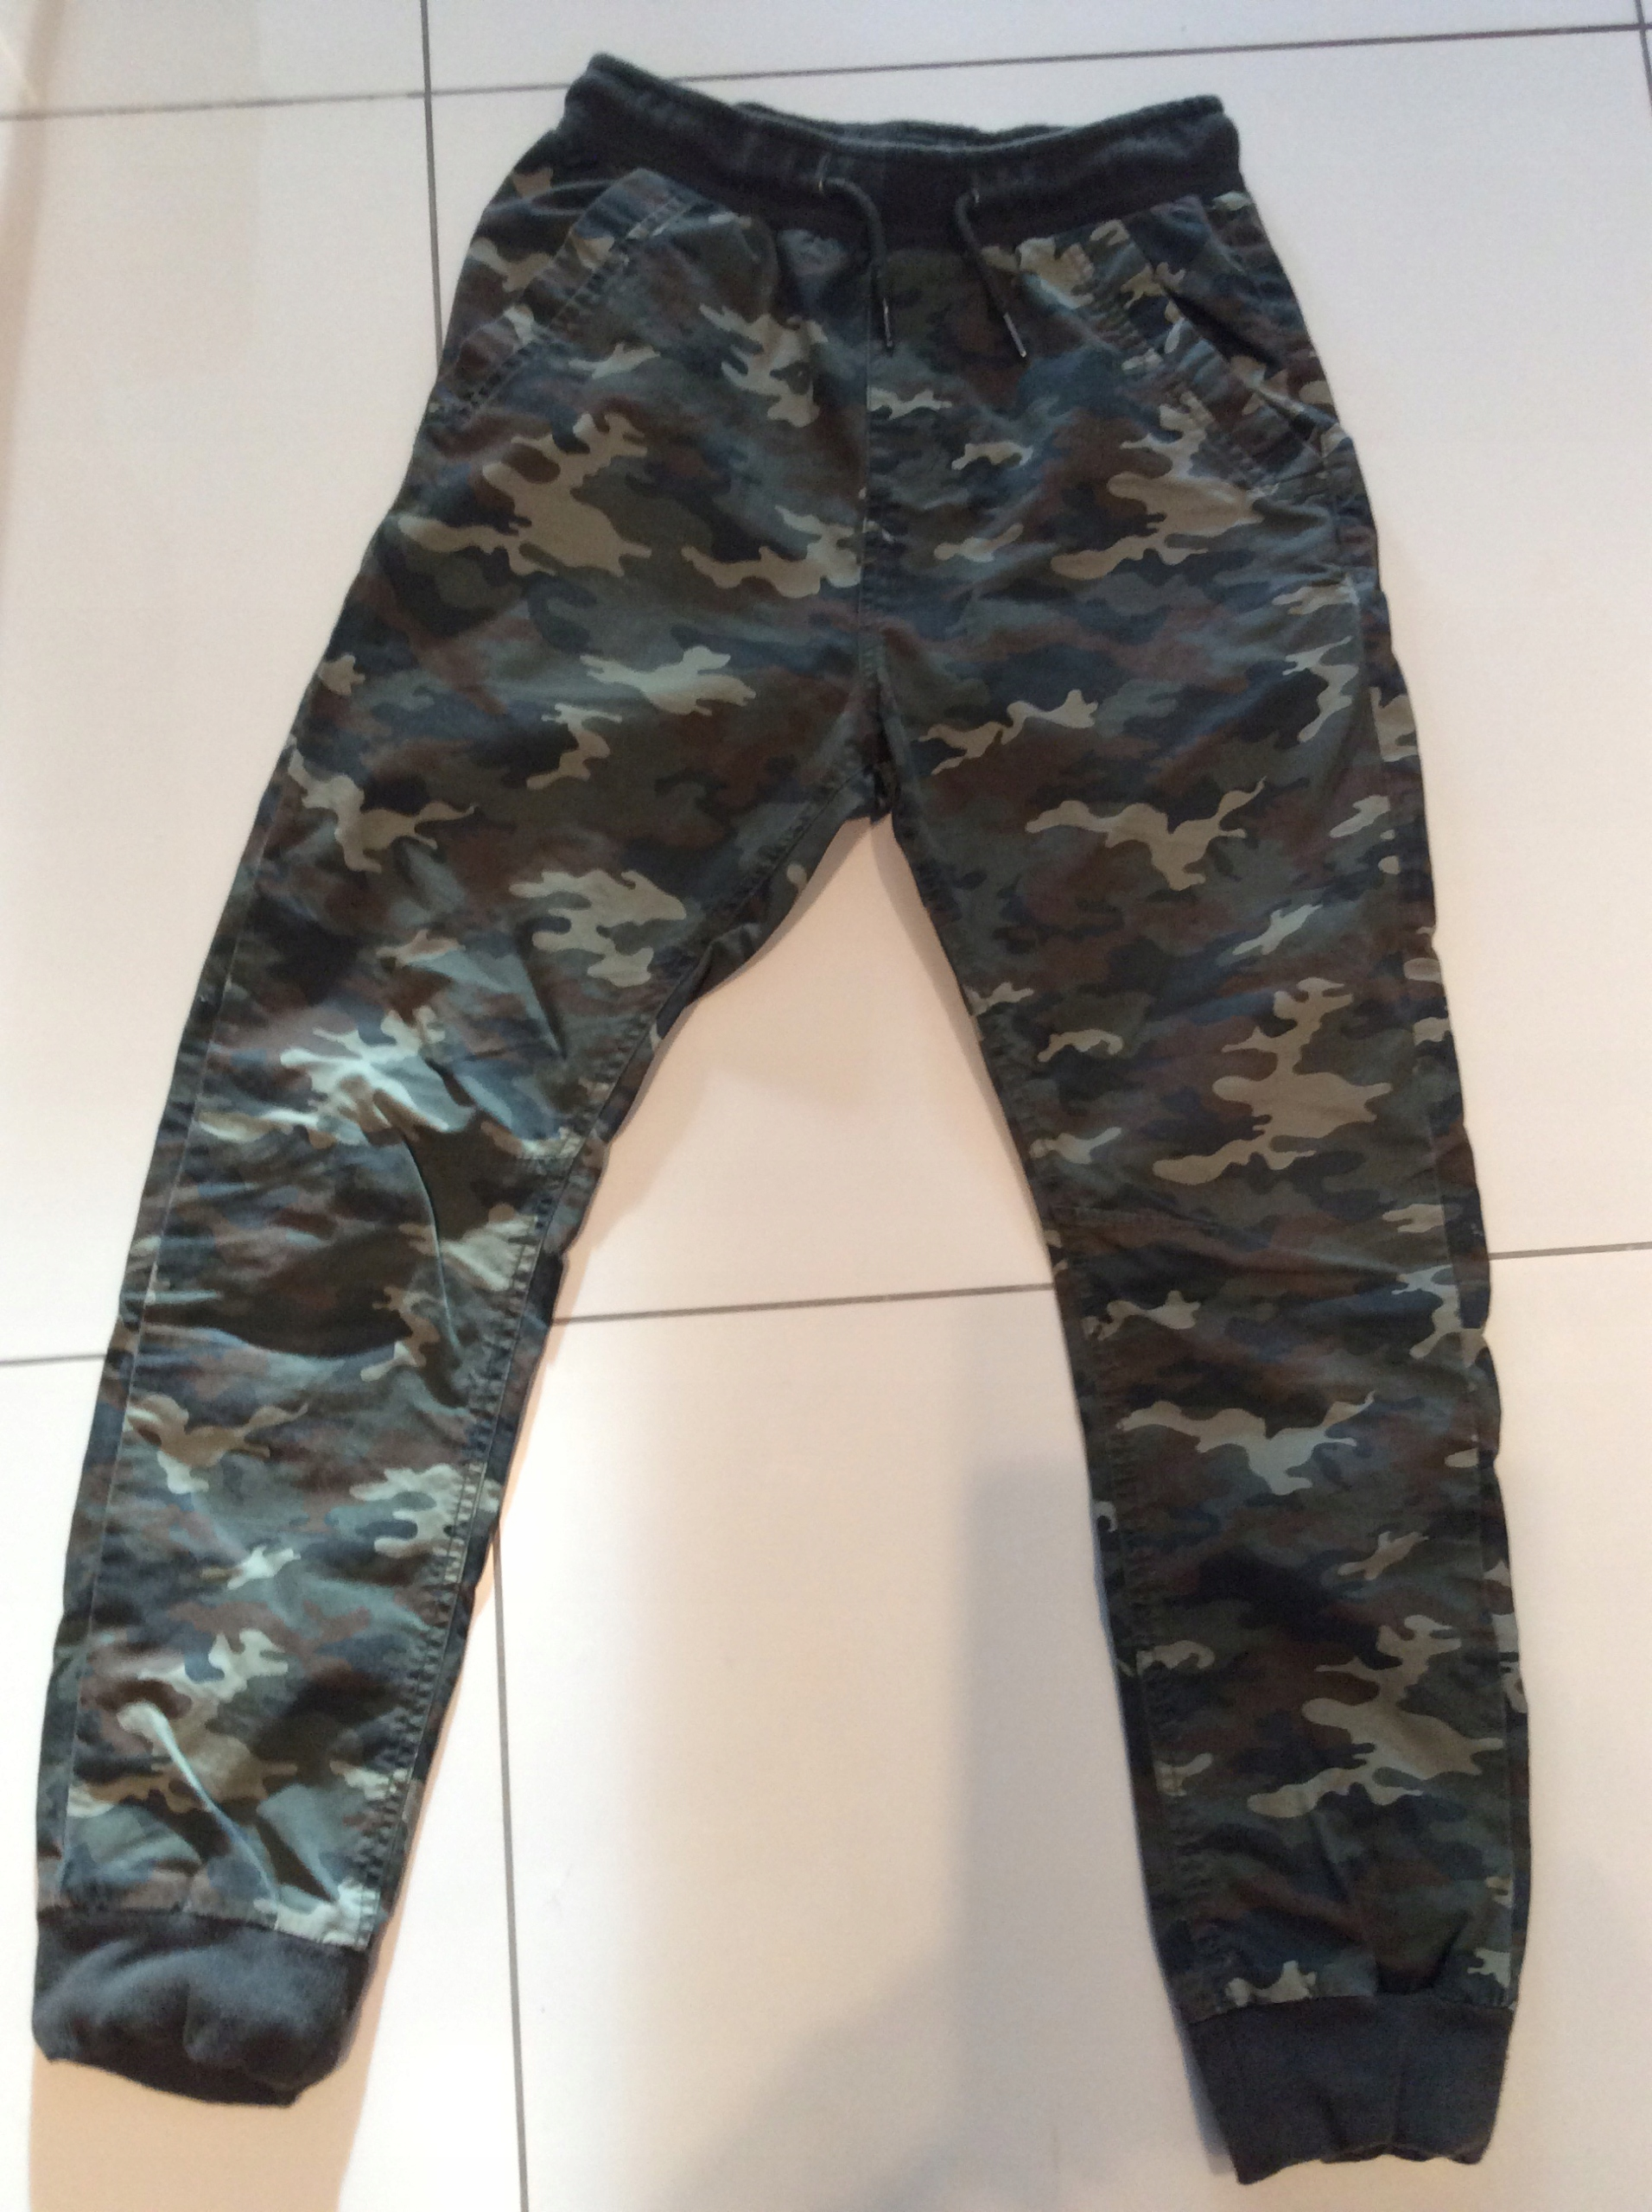 66c6580a3fe3 Spodnie moro RESERVED roz 158 - 7648806498 - oficjalne archiwum allegro